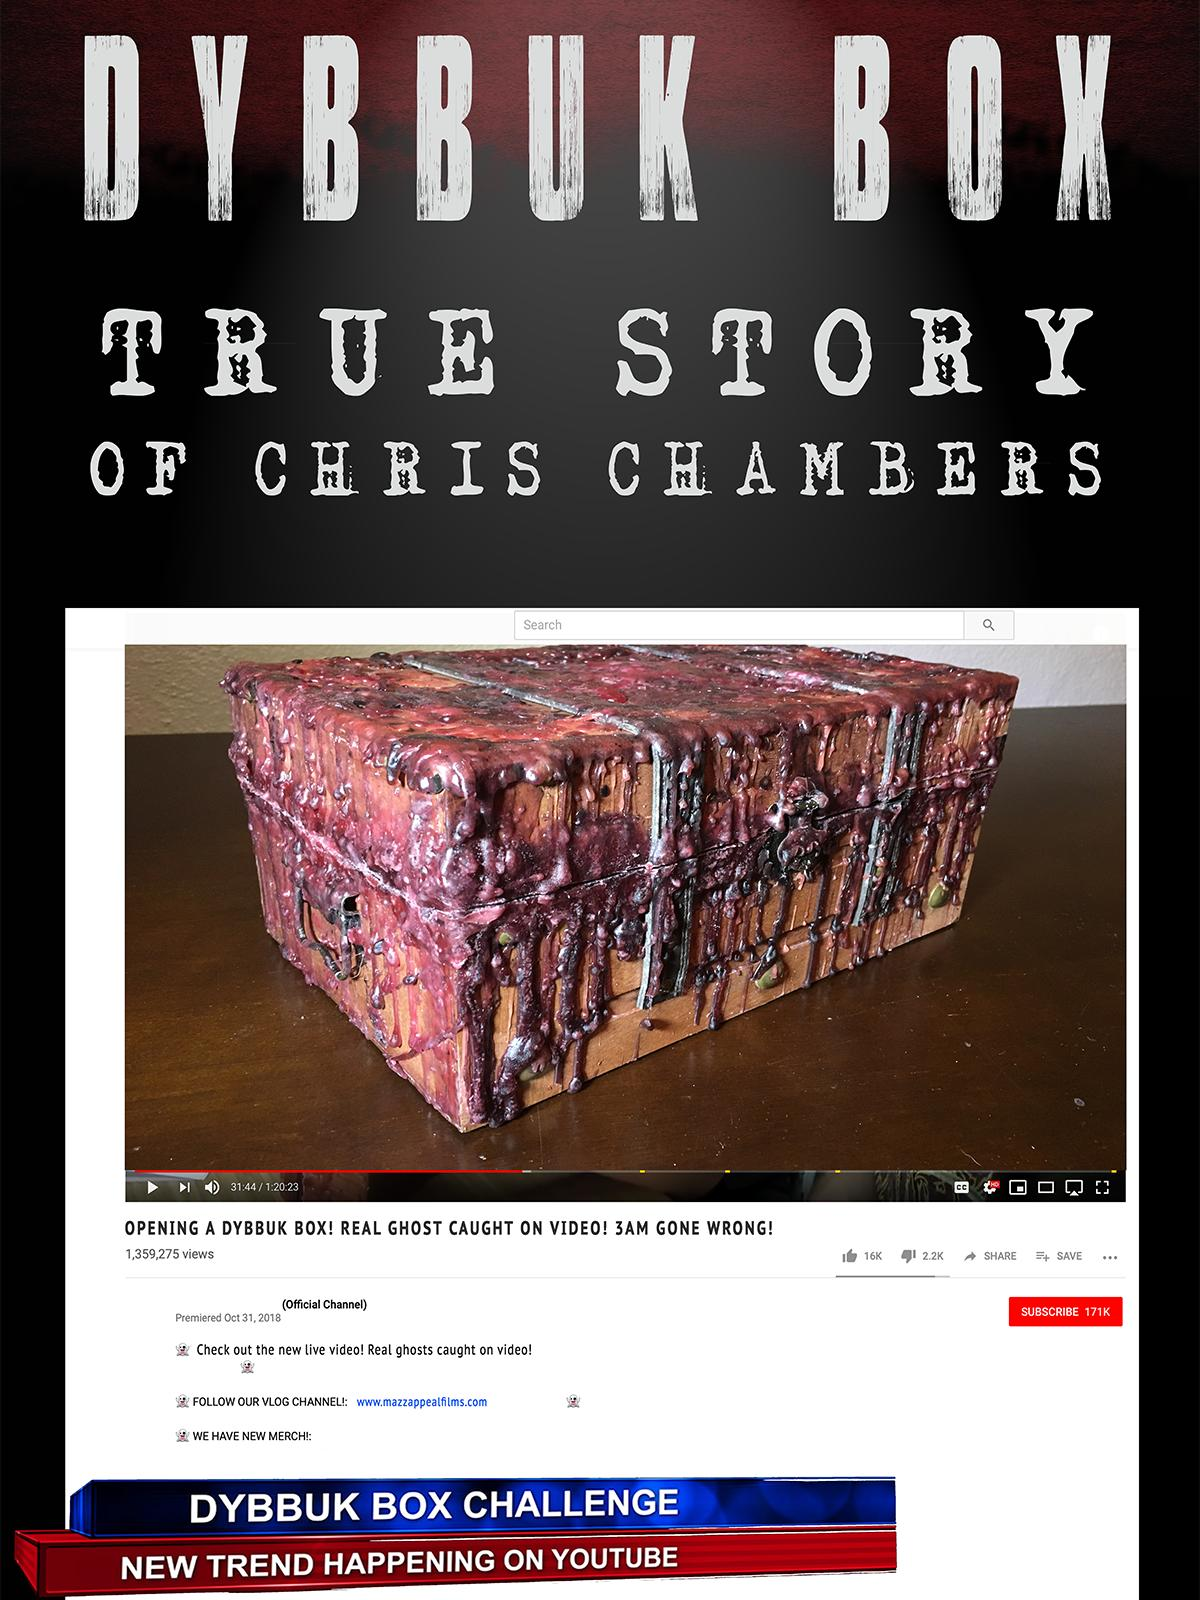 Dybbuk Box: The Story of Chris Chambers (2019) - IMDb